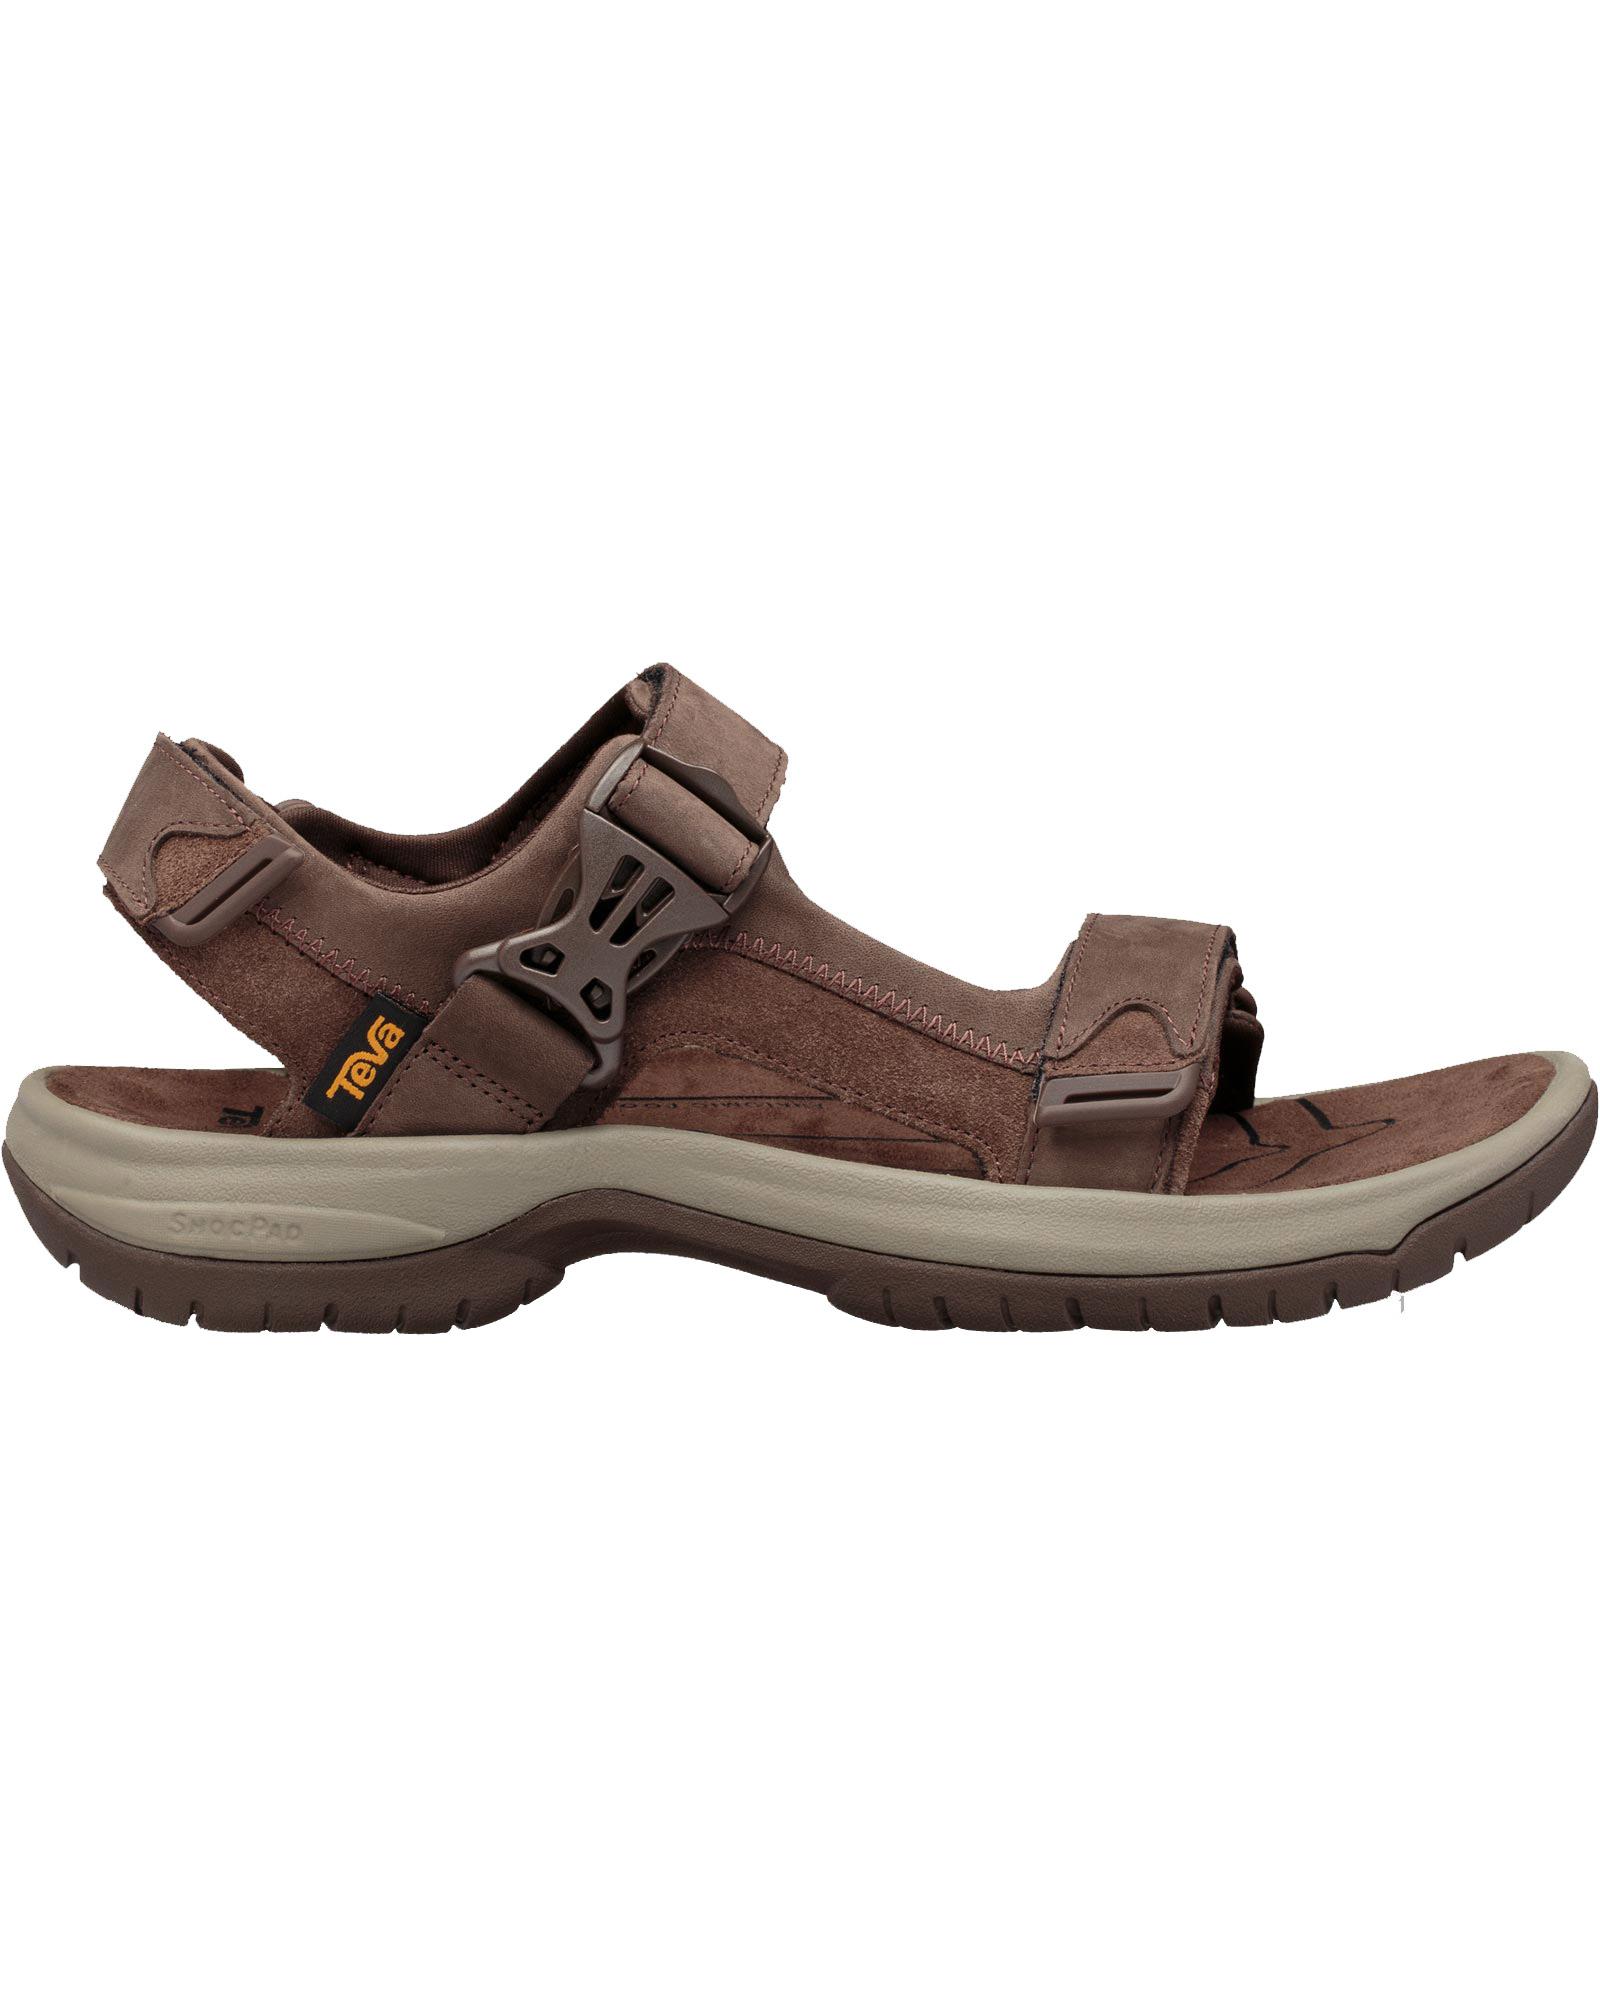 Teva Men's Tanway Leather Sandals 0